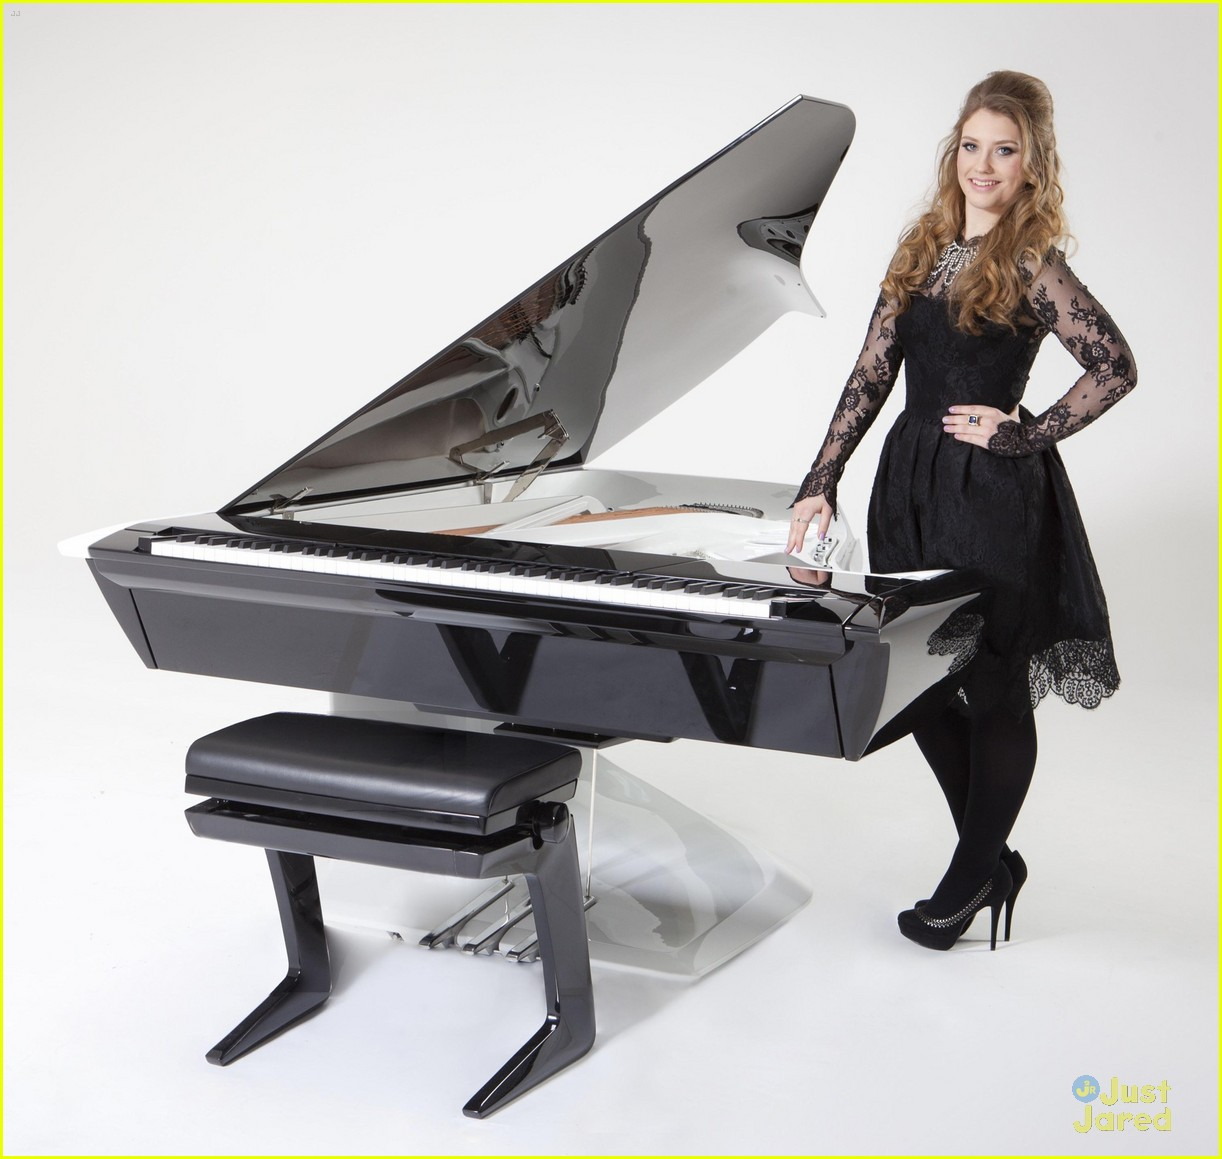 ella henderson peugeot piano 01